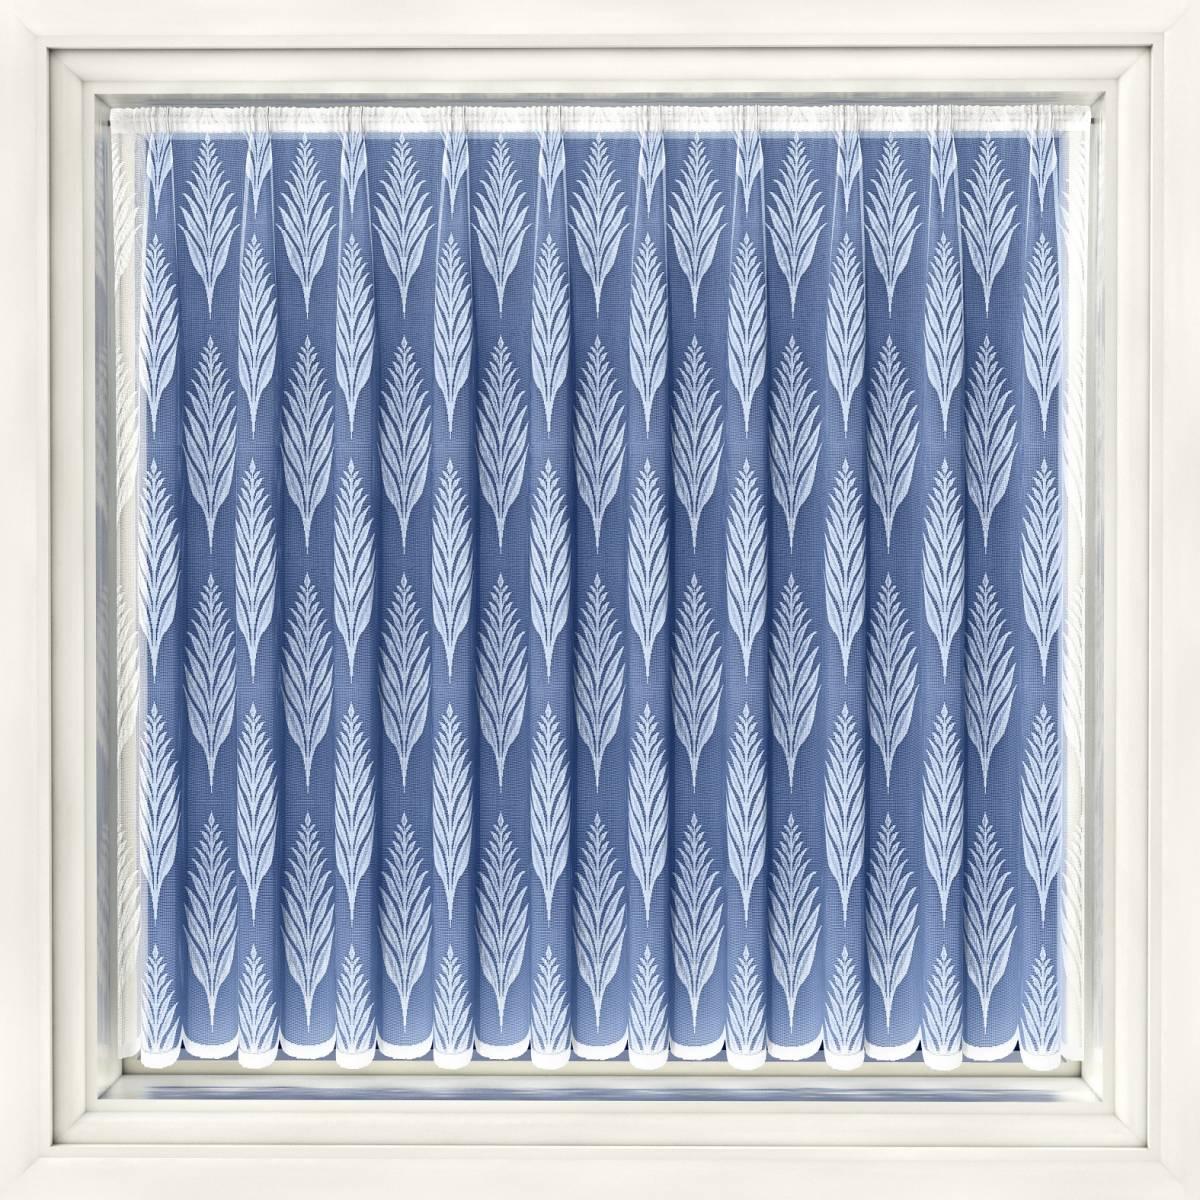 modern leaf white net curtain net curtain 2 curtains. Black Bedroom Furniture Sets. Home Design Ideas